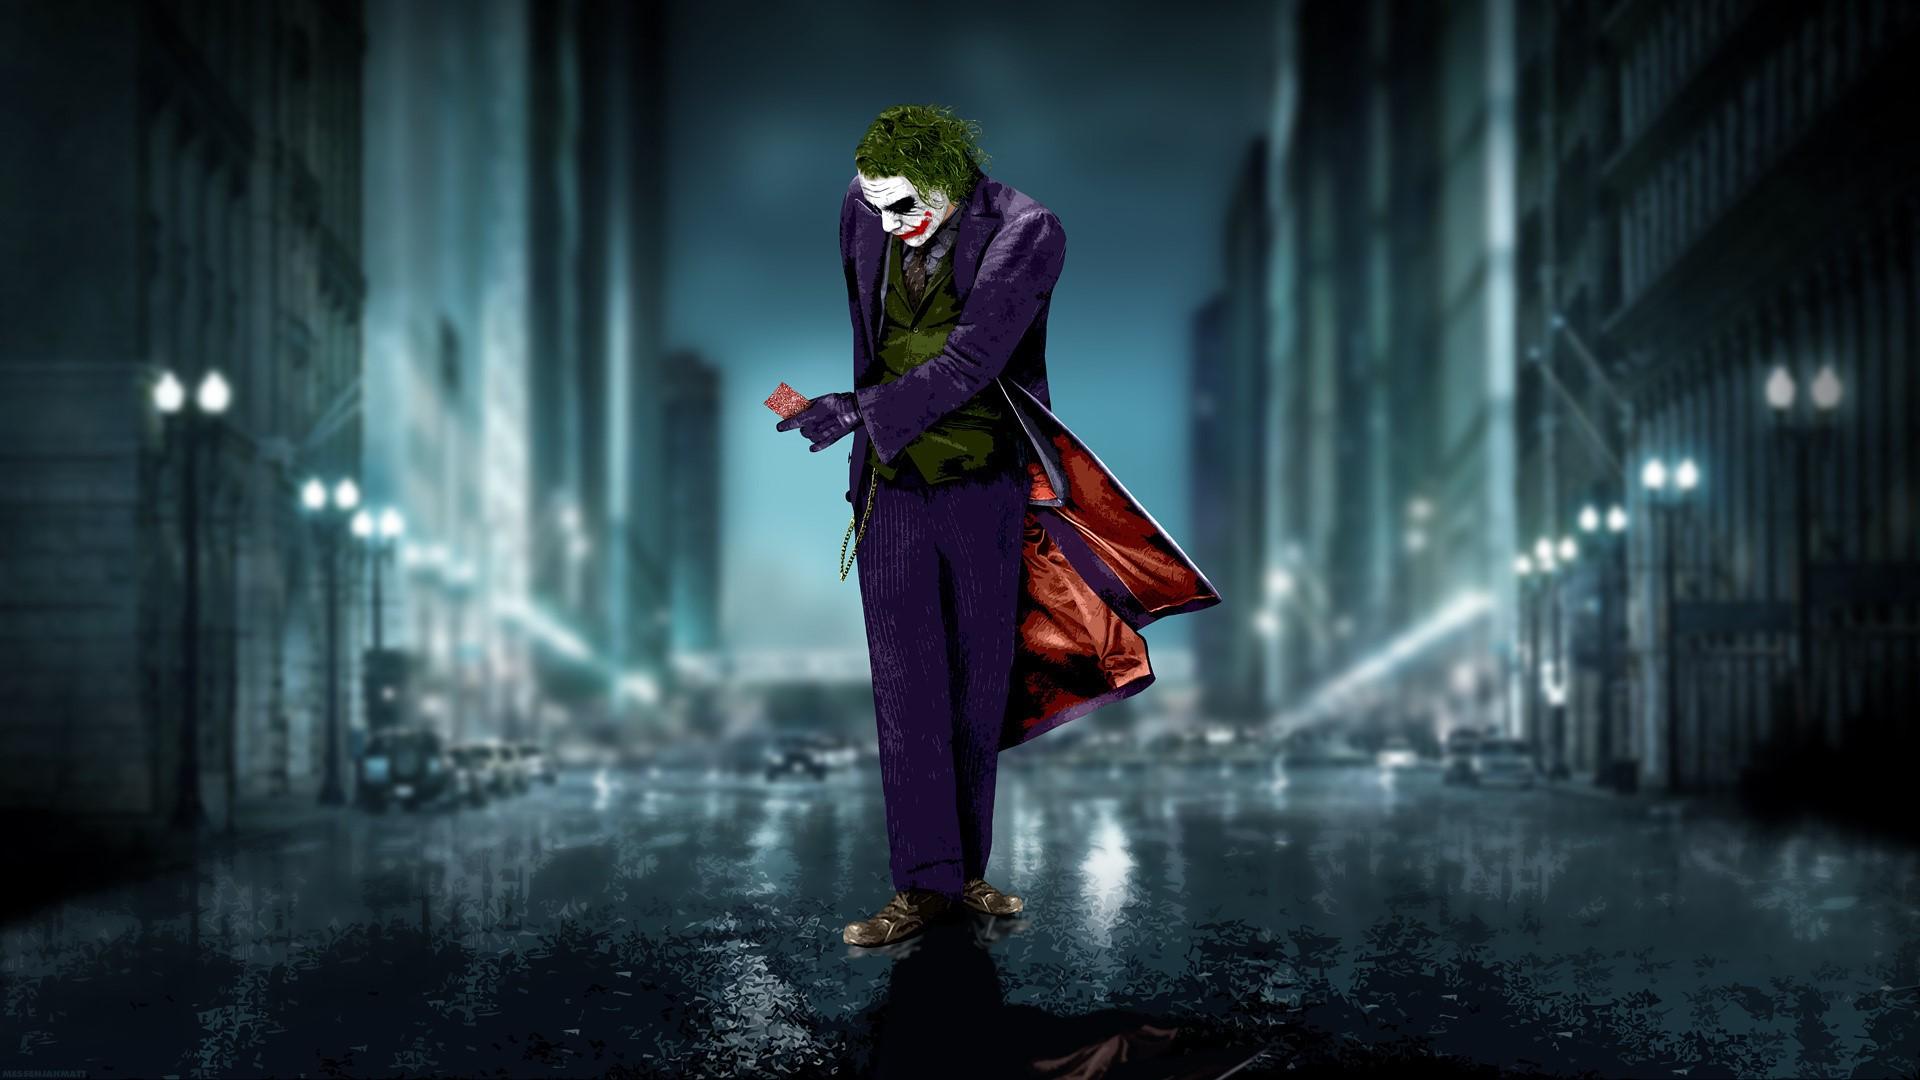 Joker uhd wallpaper